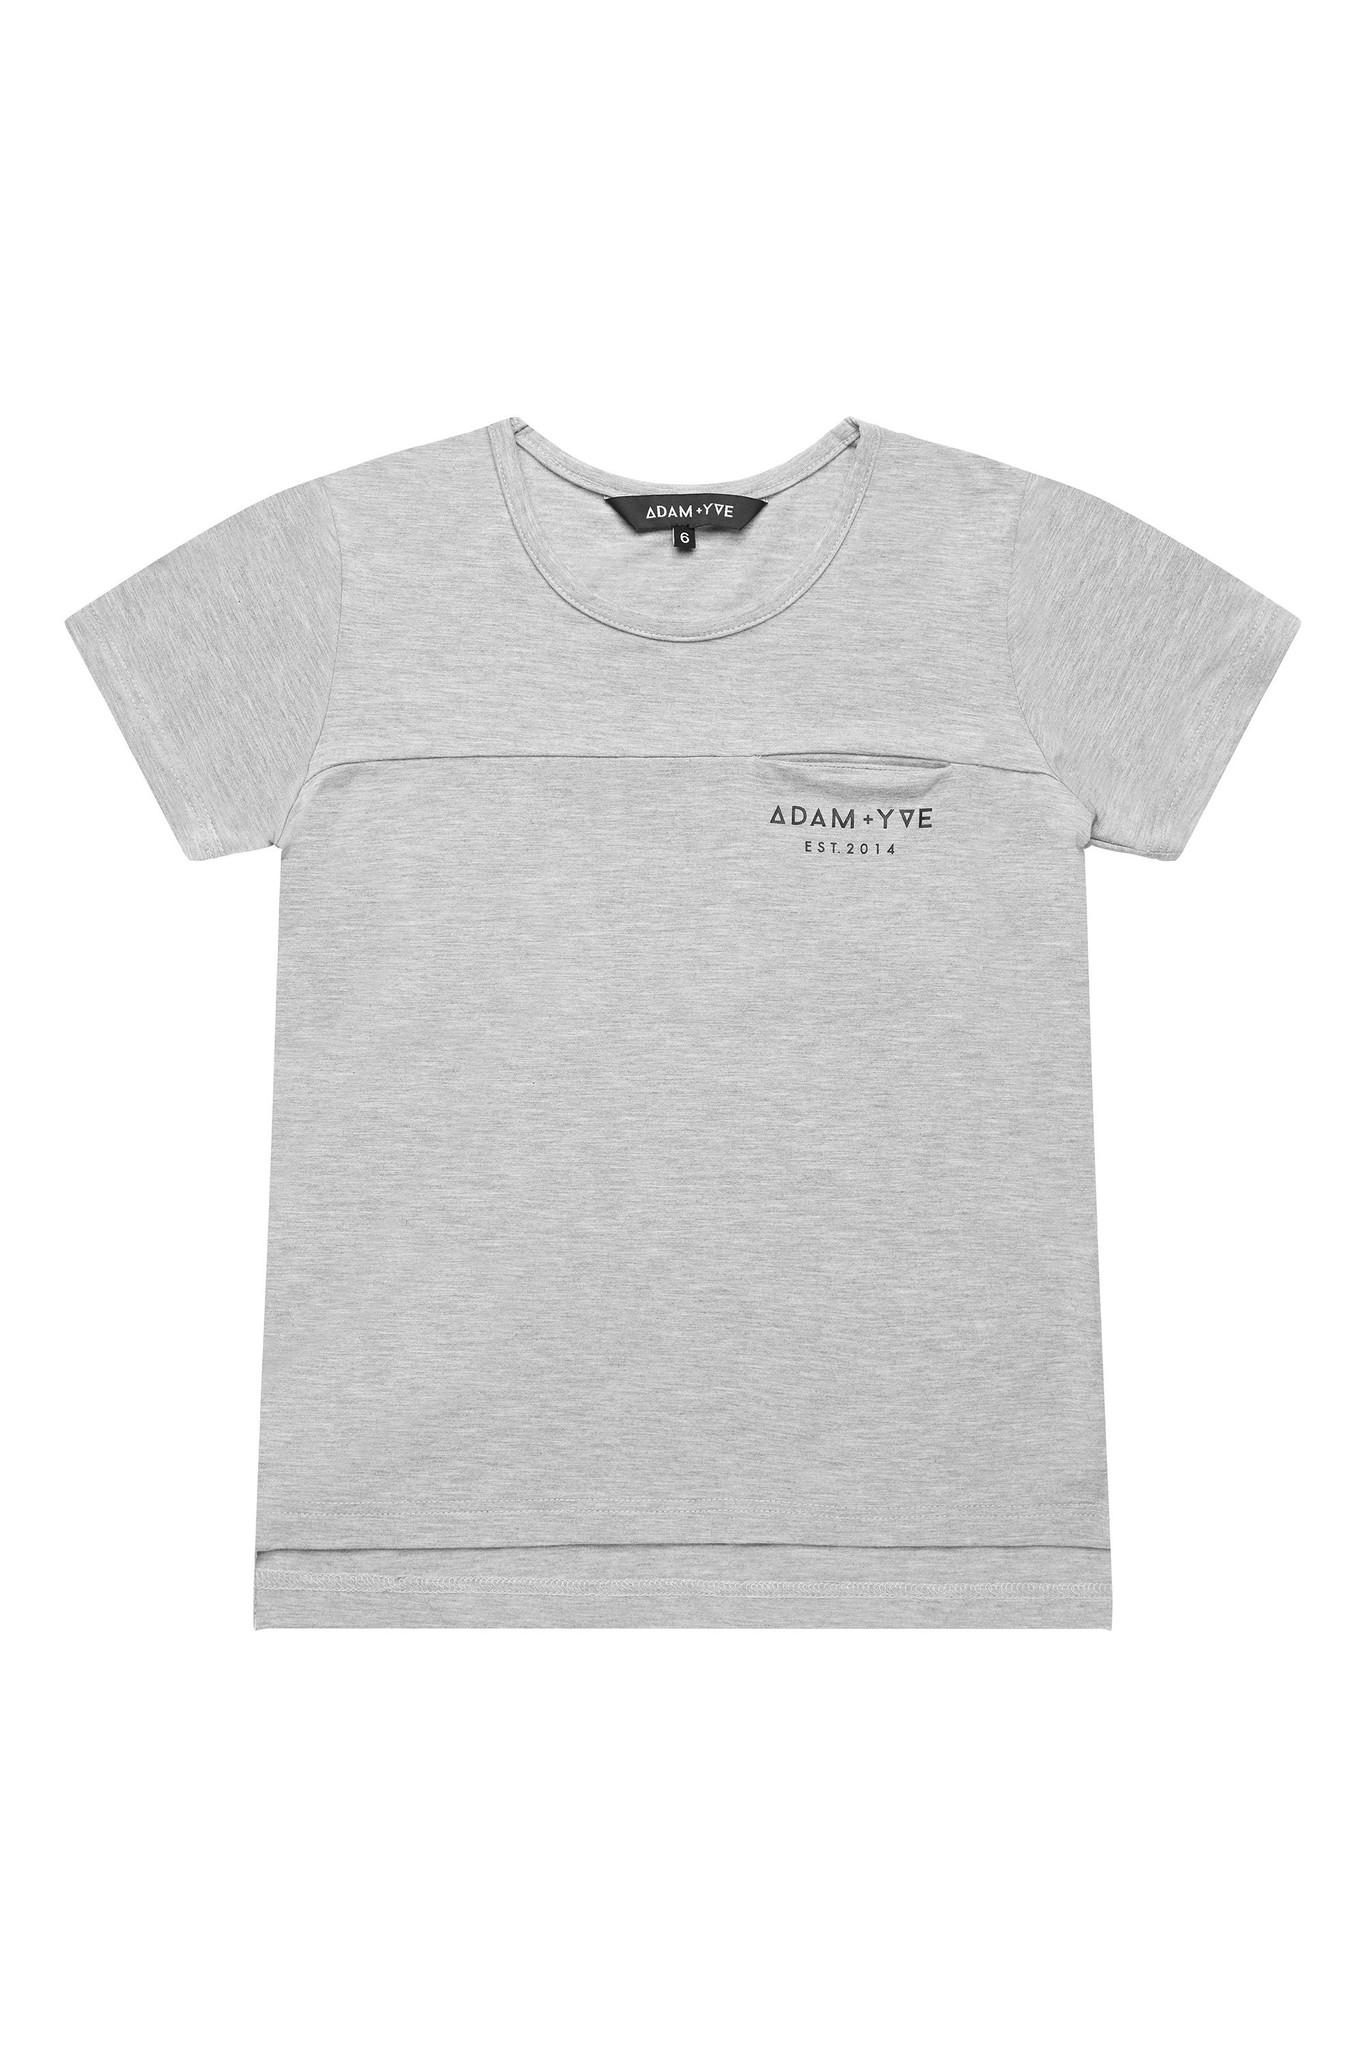 Adam + Yve GRAY T-SHIRT FOR BOYS | COOL SHIRT | CHILDREN'S CLOTHING